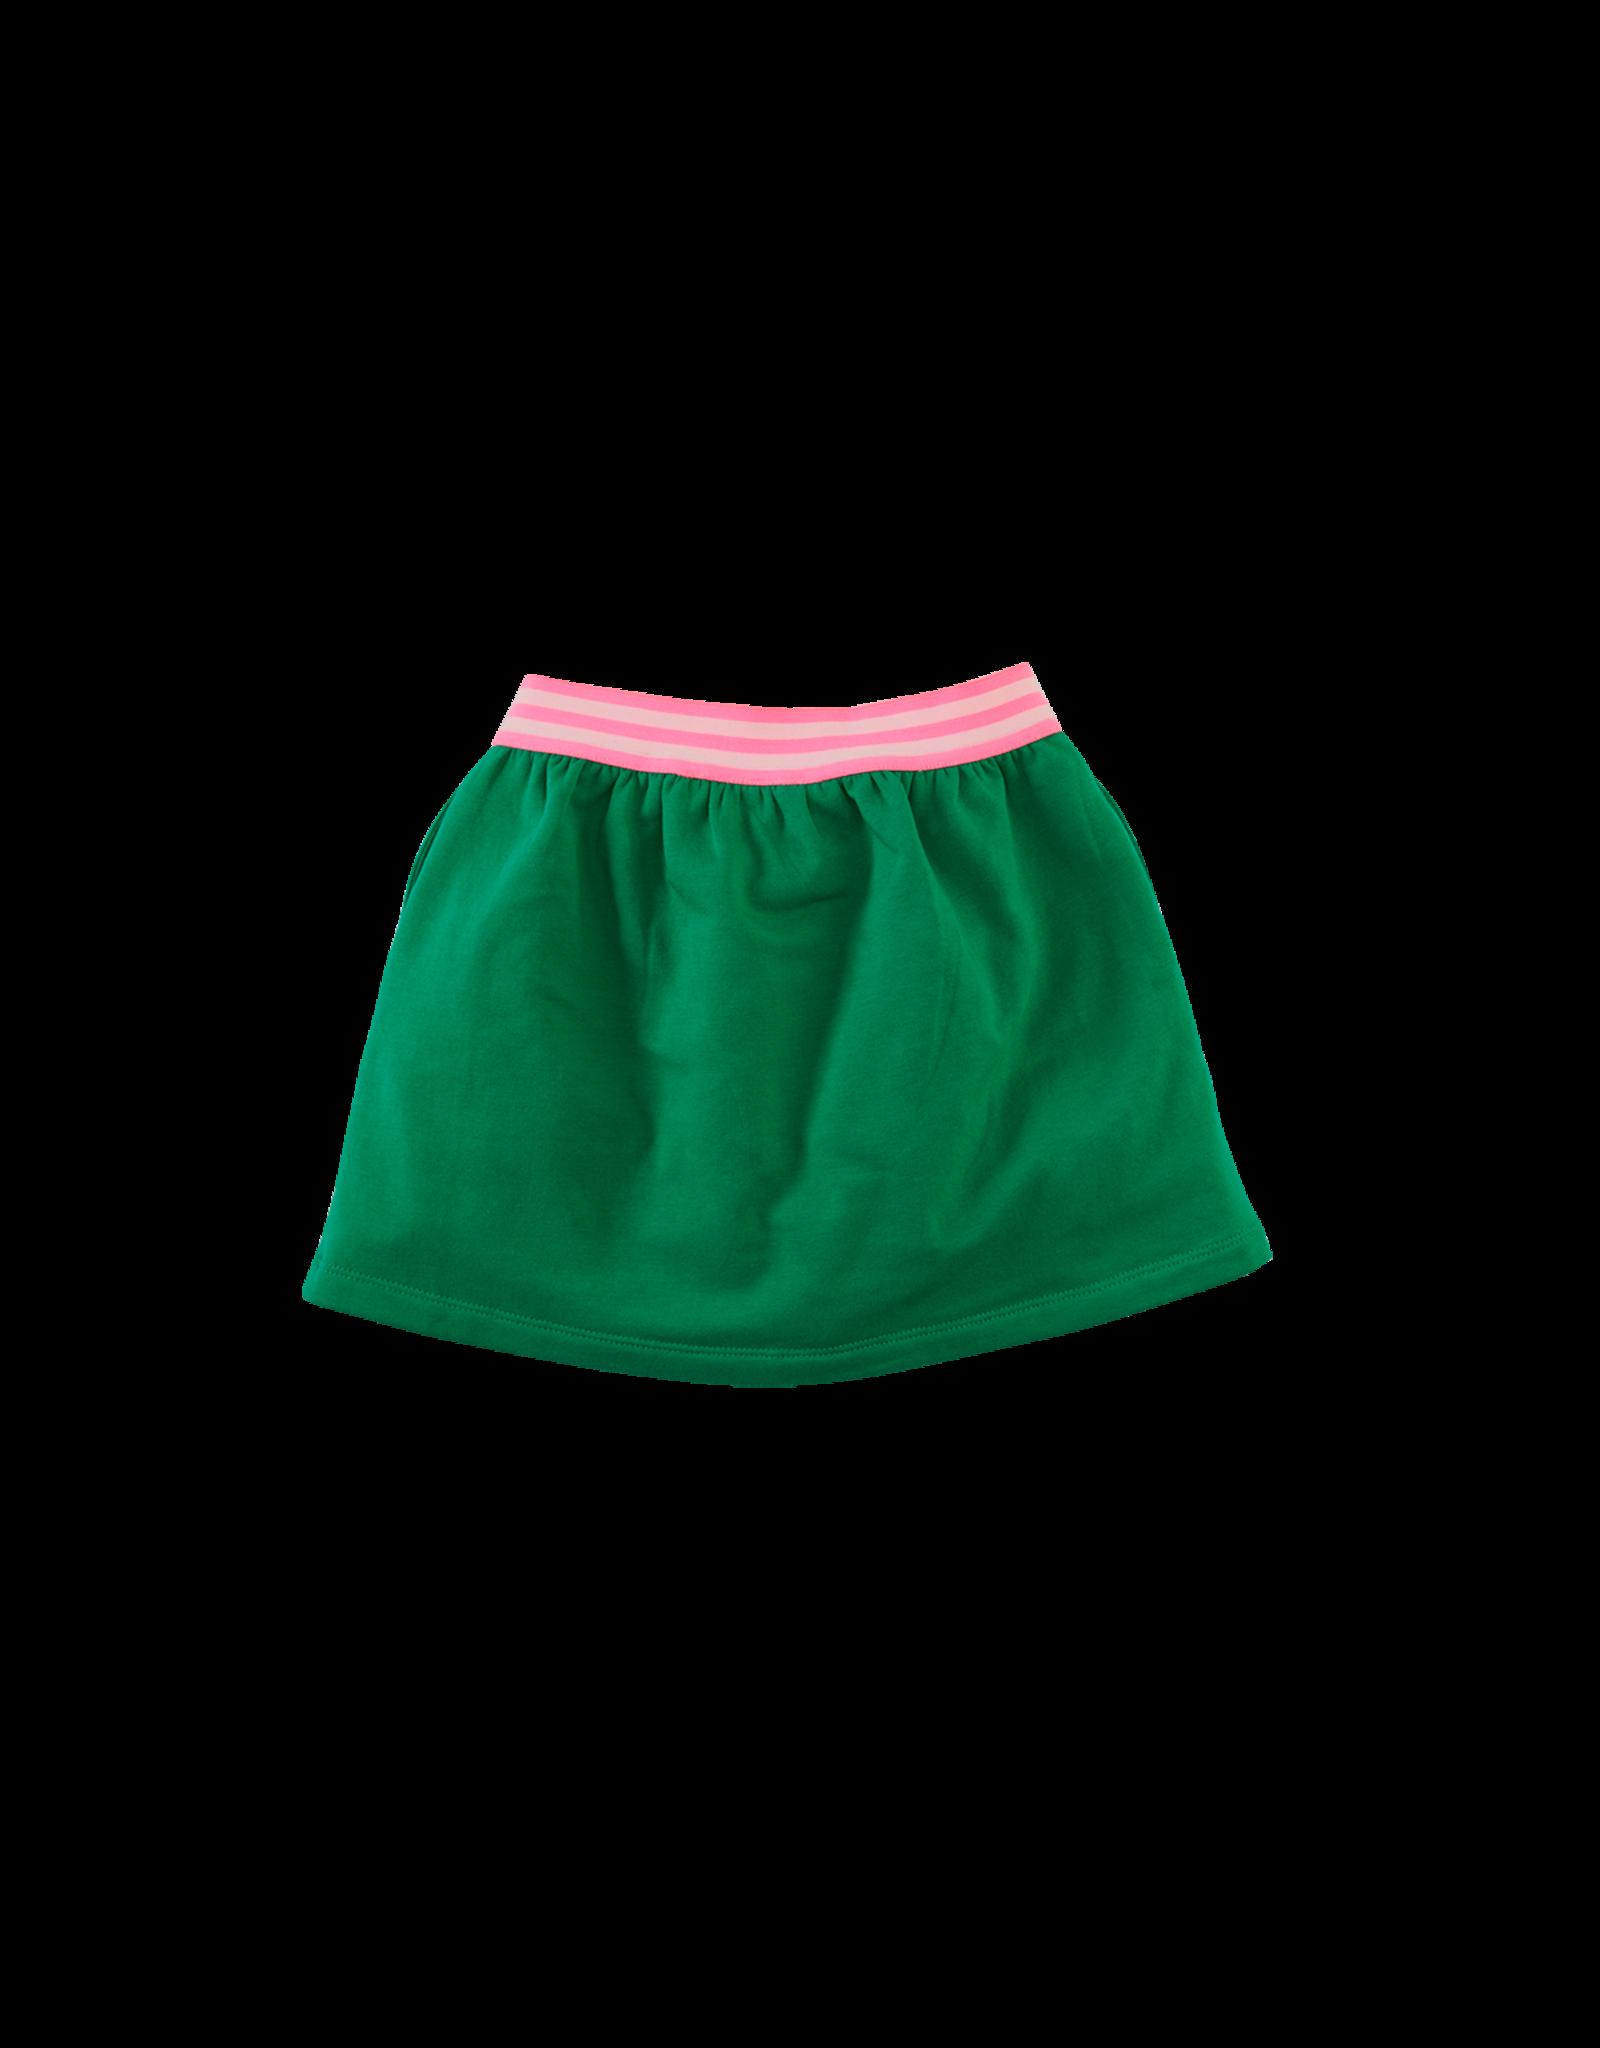 Vive - groovy green